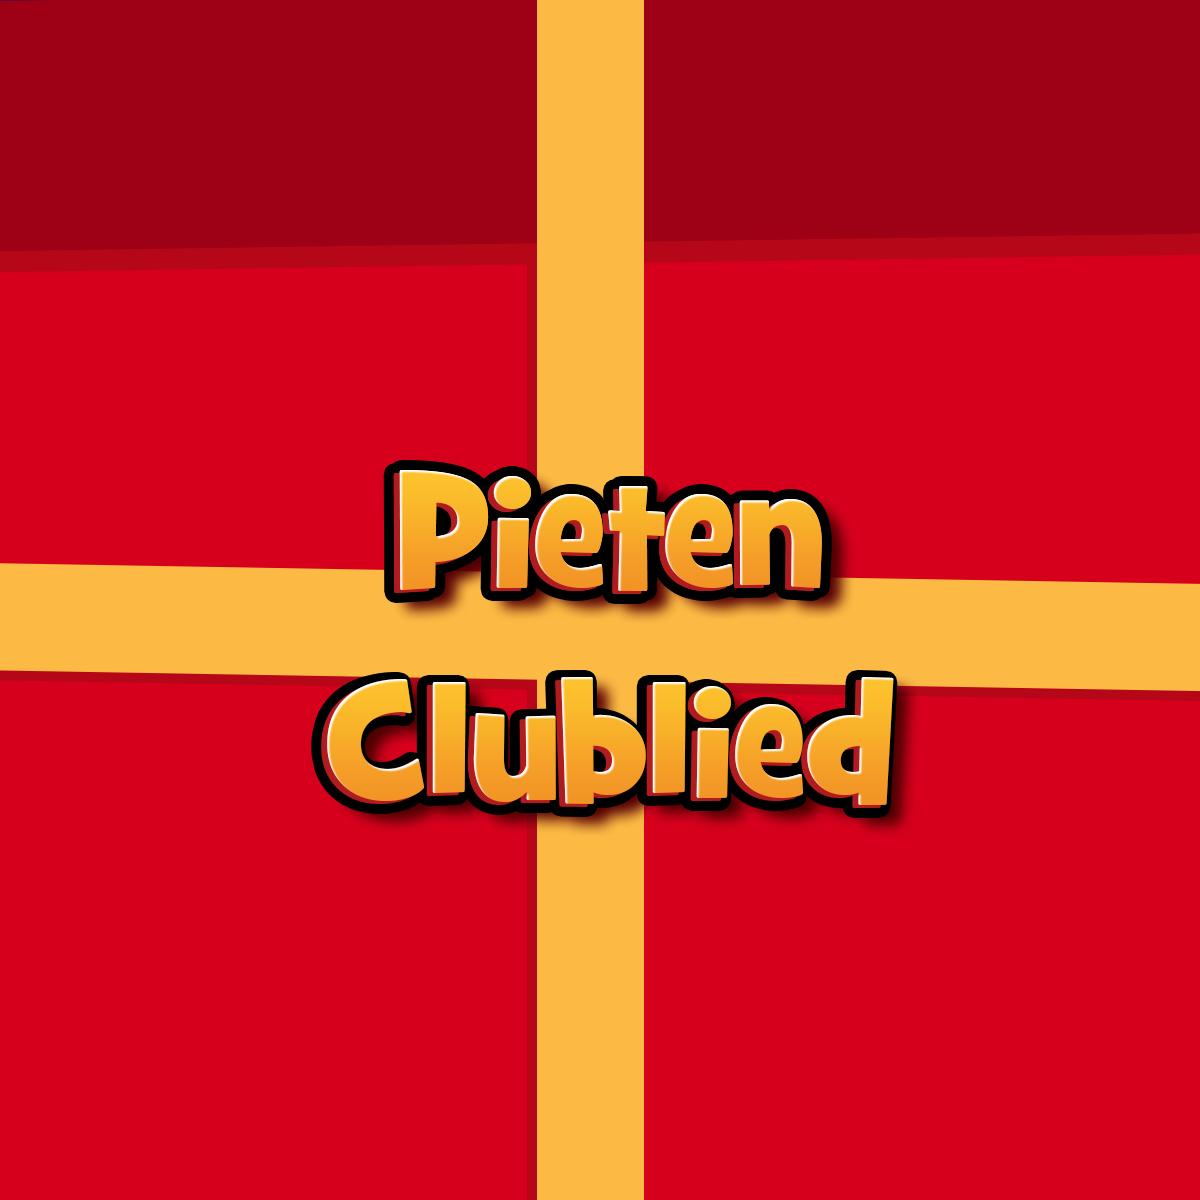 Coole Piet zingt Pieten Clublied